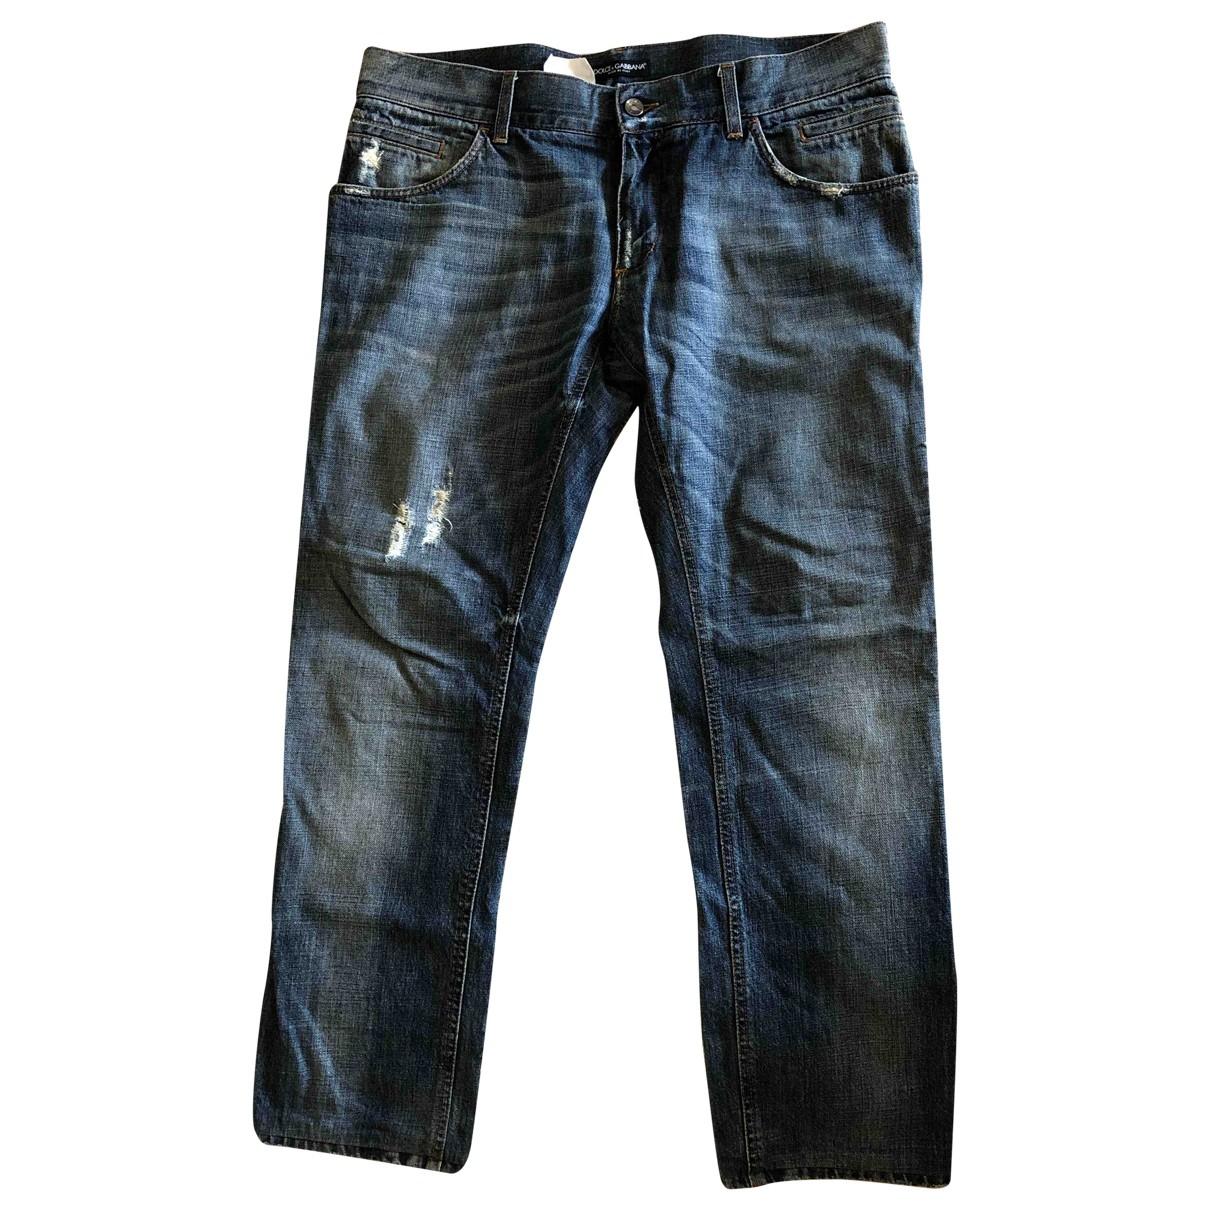 Dolce & Gabbana \N Blue Cotton Jeans for Men 46 FR